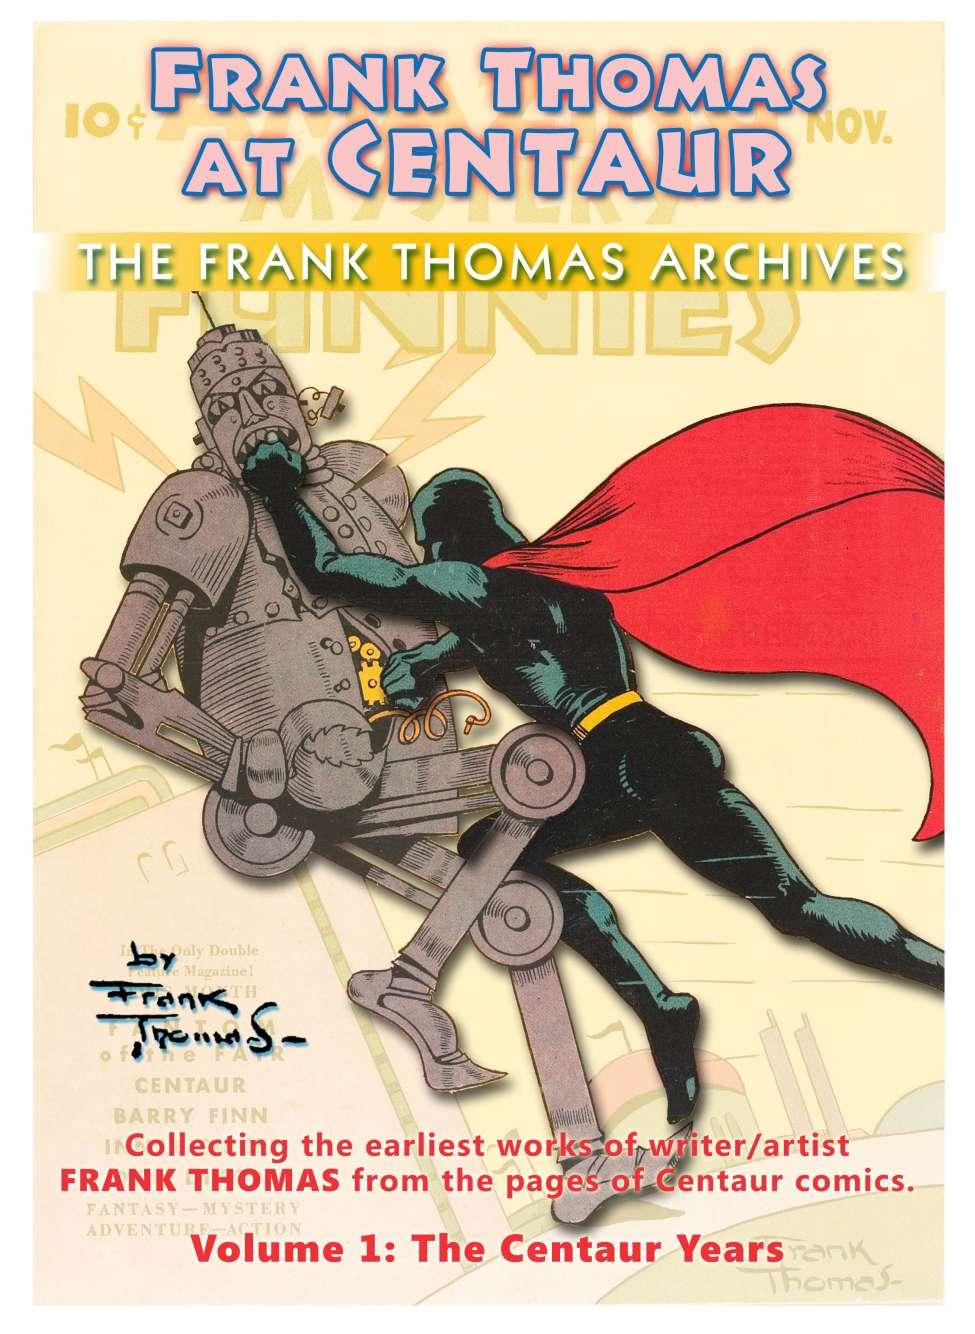 Comic Book Cover For Frank Thomas Archives v1 - Centaur Years (Centaur)